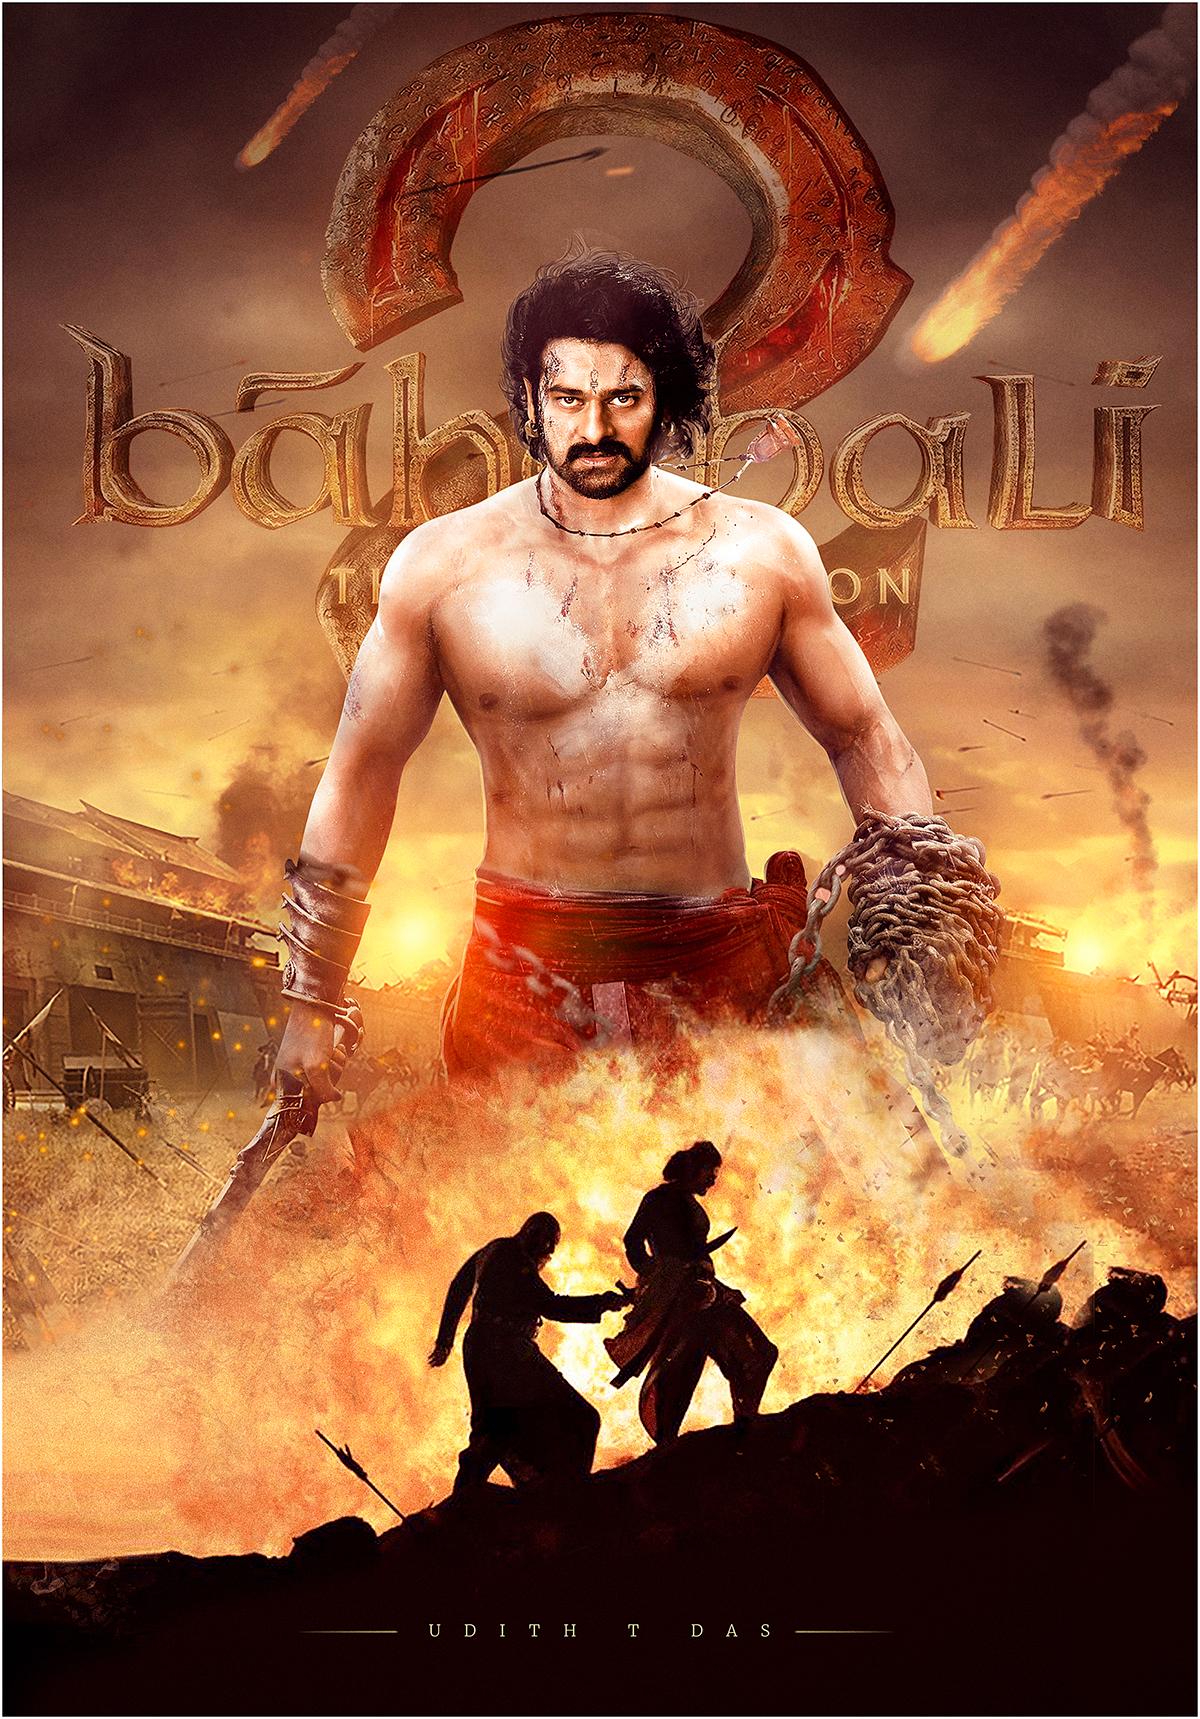 bahubali poster on behance